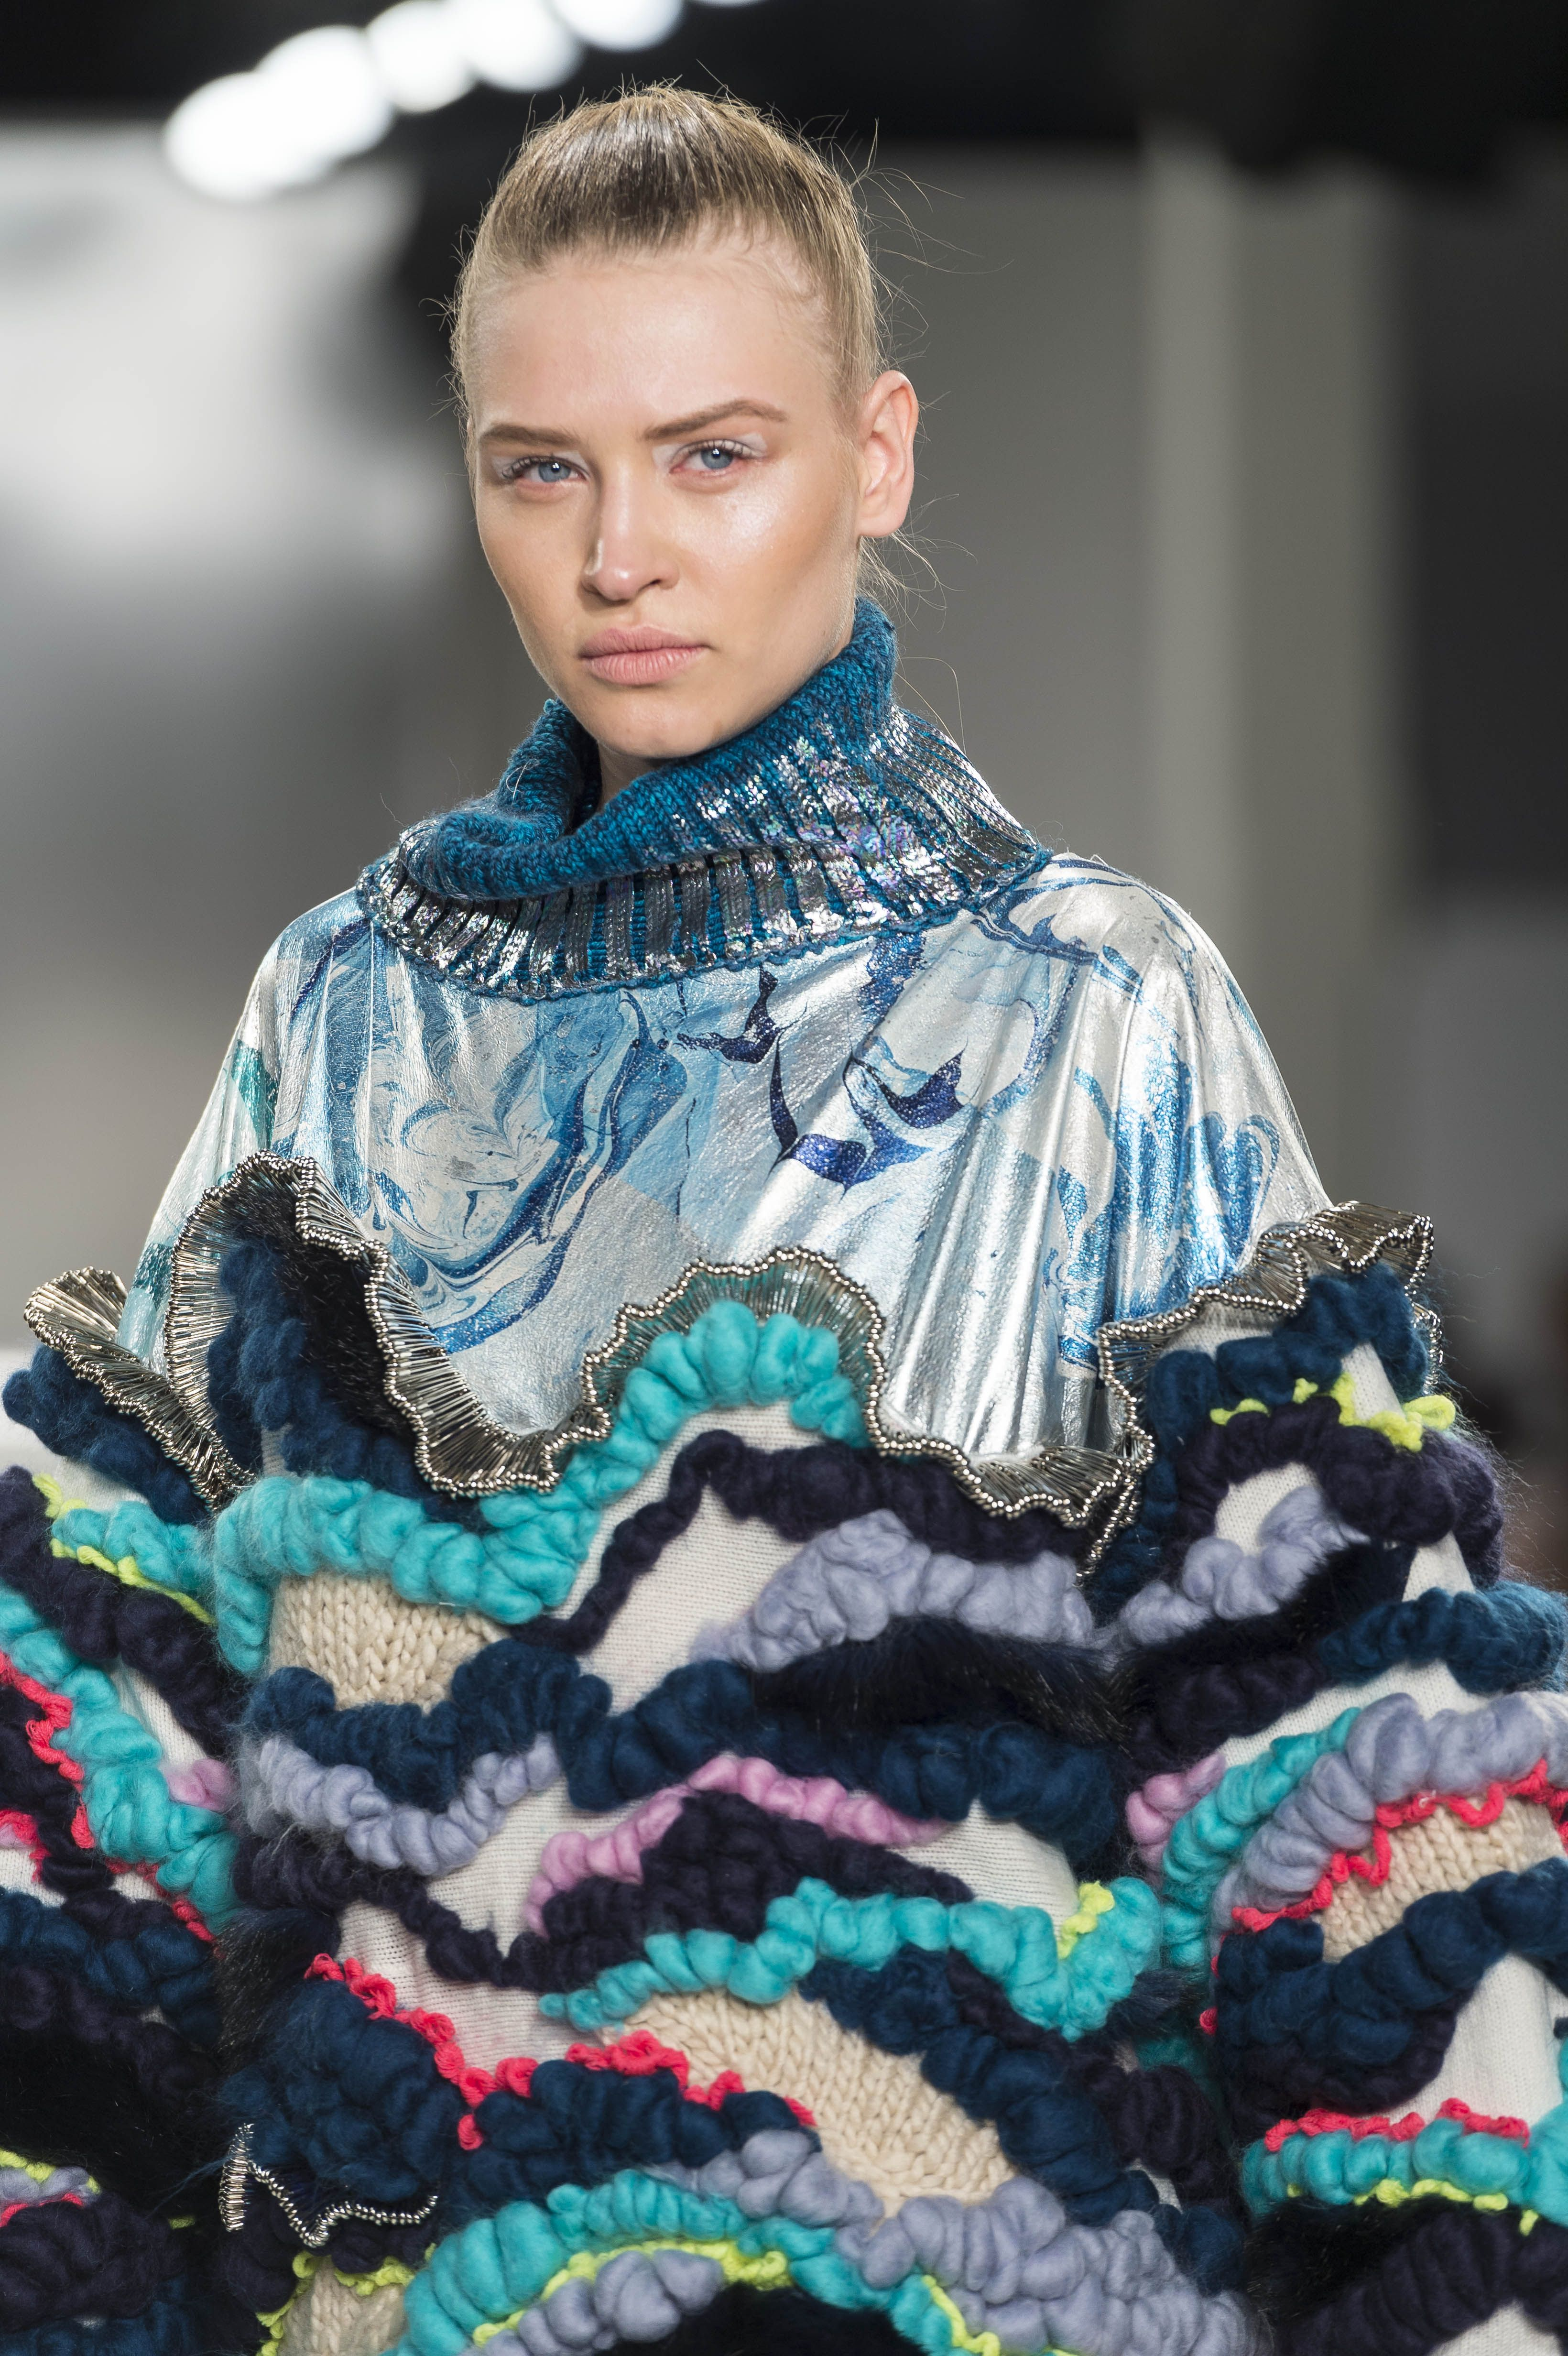 Design By De Montfort University Dmu Fashion Design Student Imogen Abbot On The Catwalk At Graduate Fashion Week G Knitwear Fashion Textiles Fashion Fashion